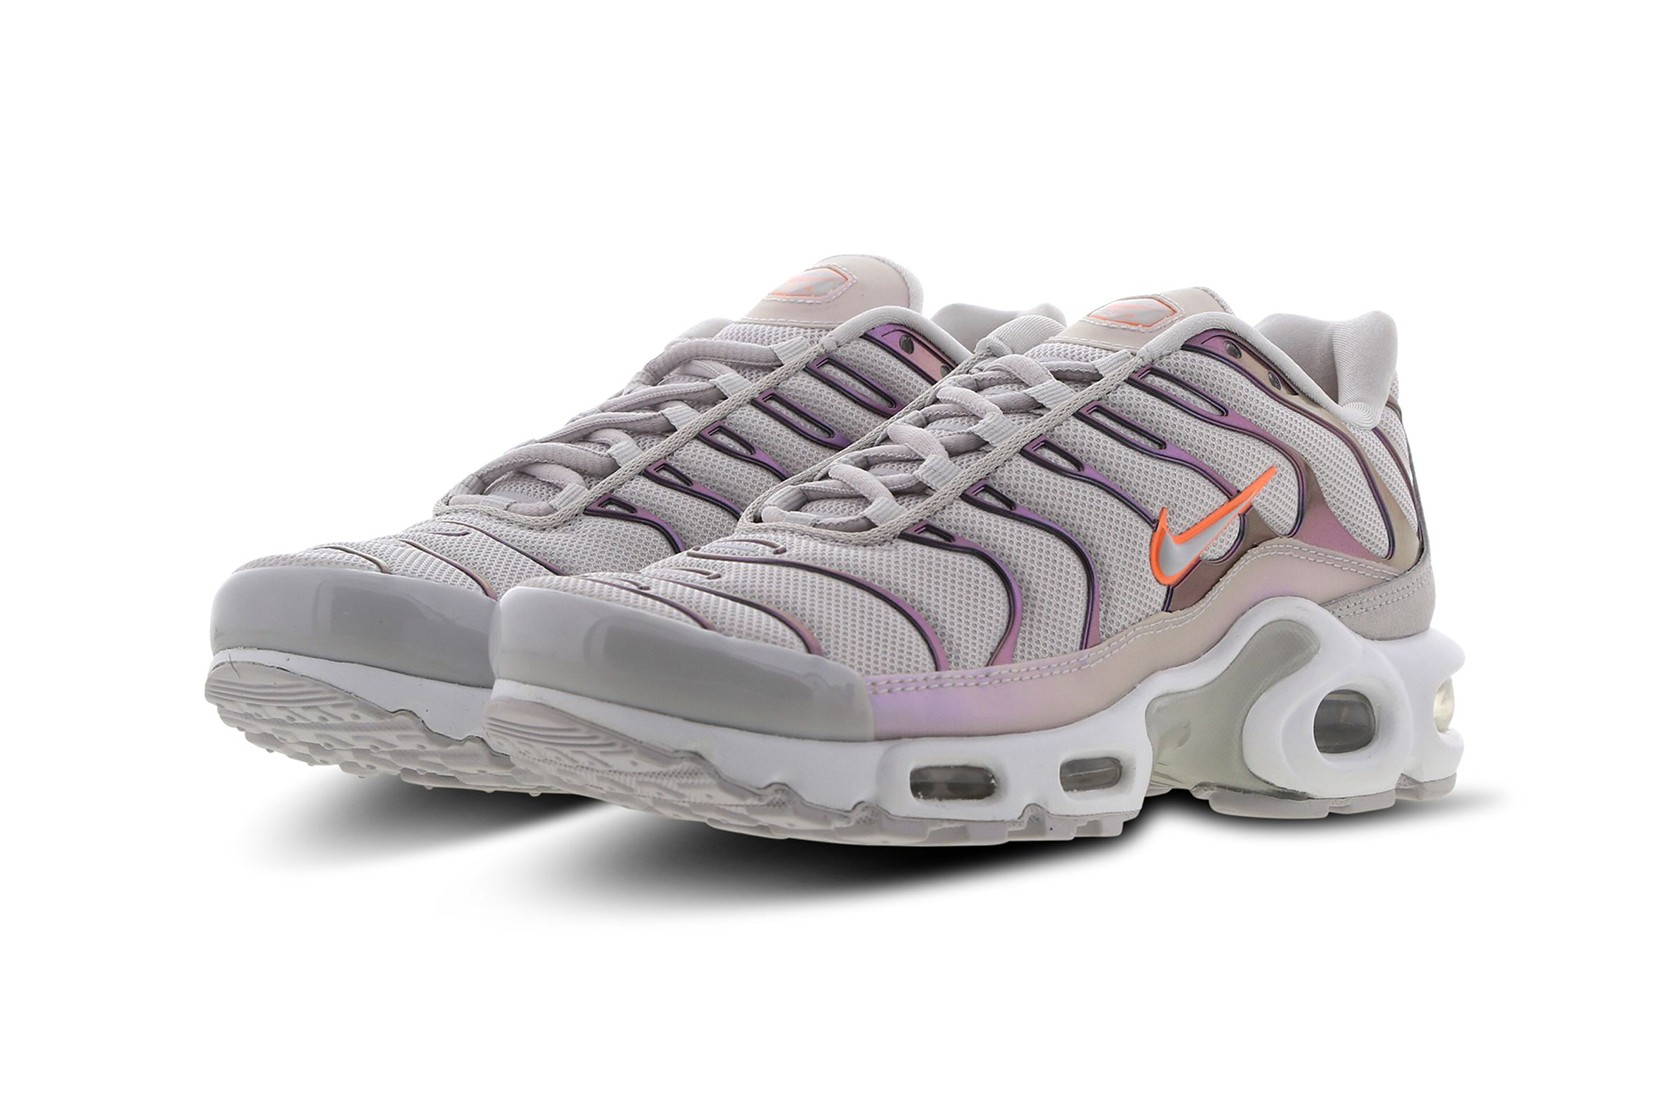 Nike Holographic TN Air Max Plus Purple